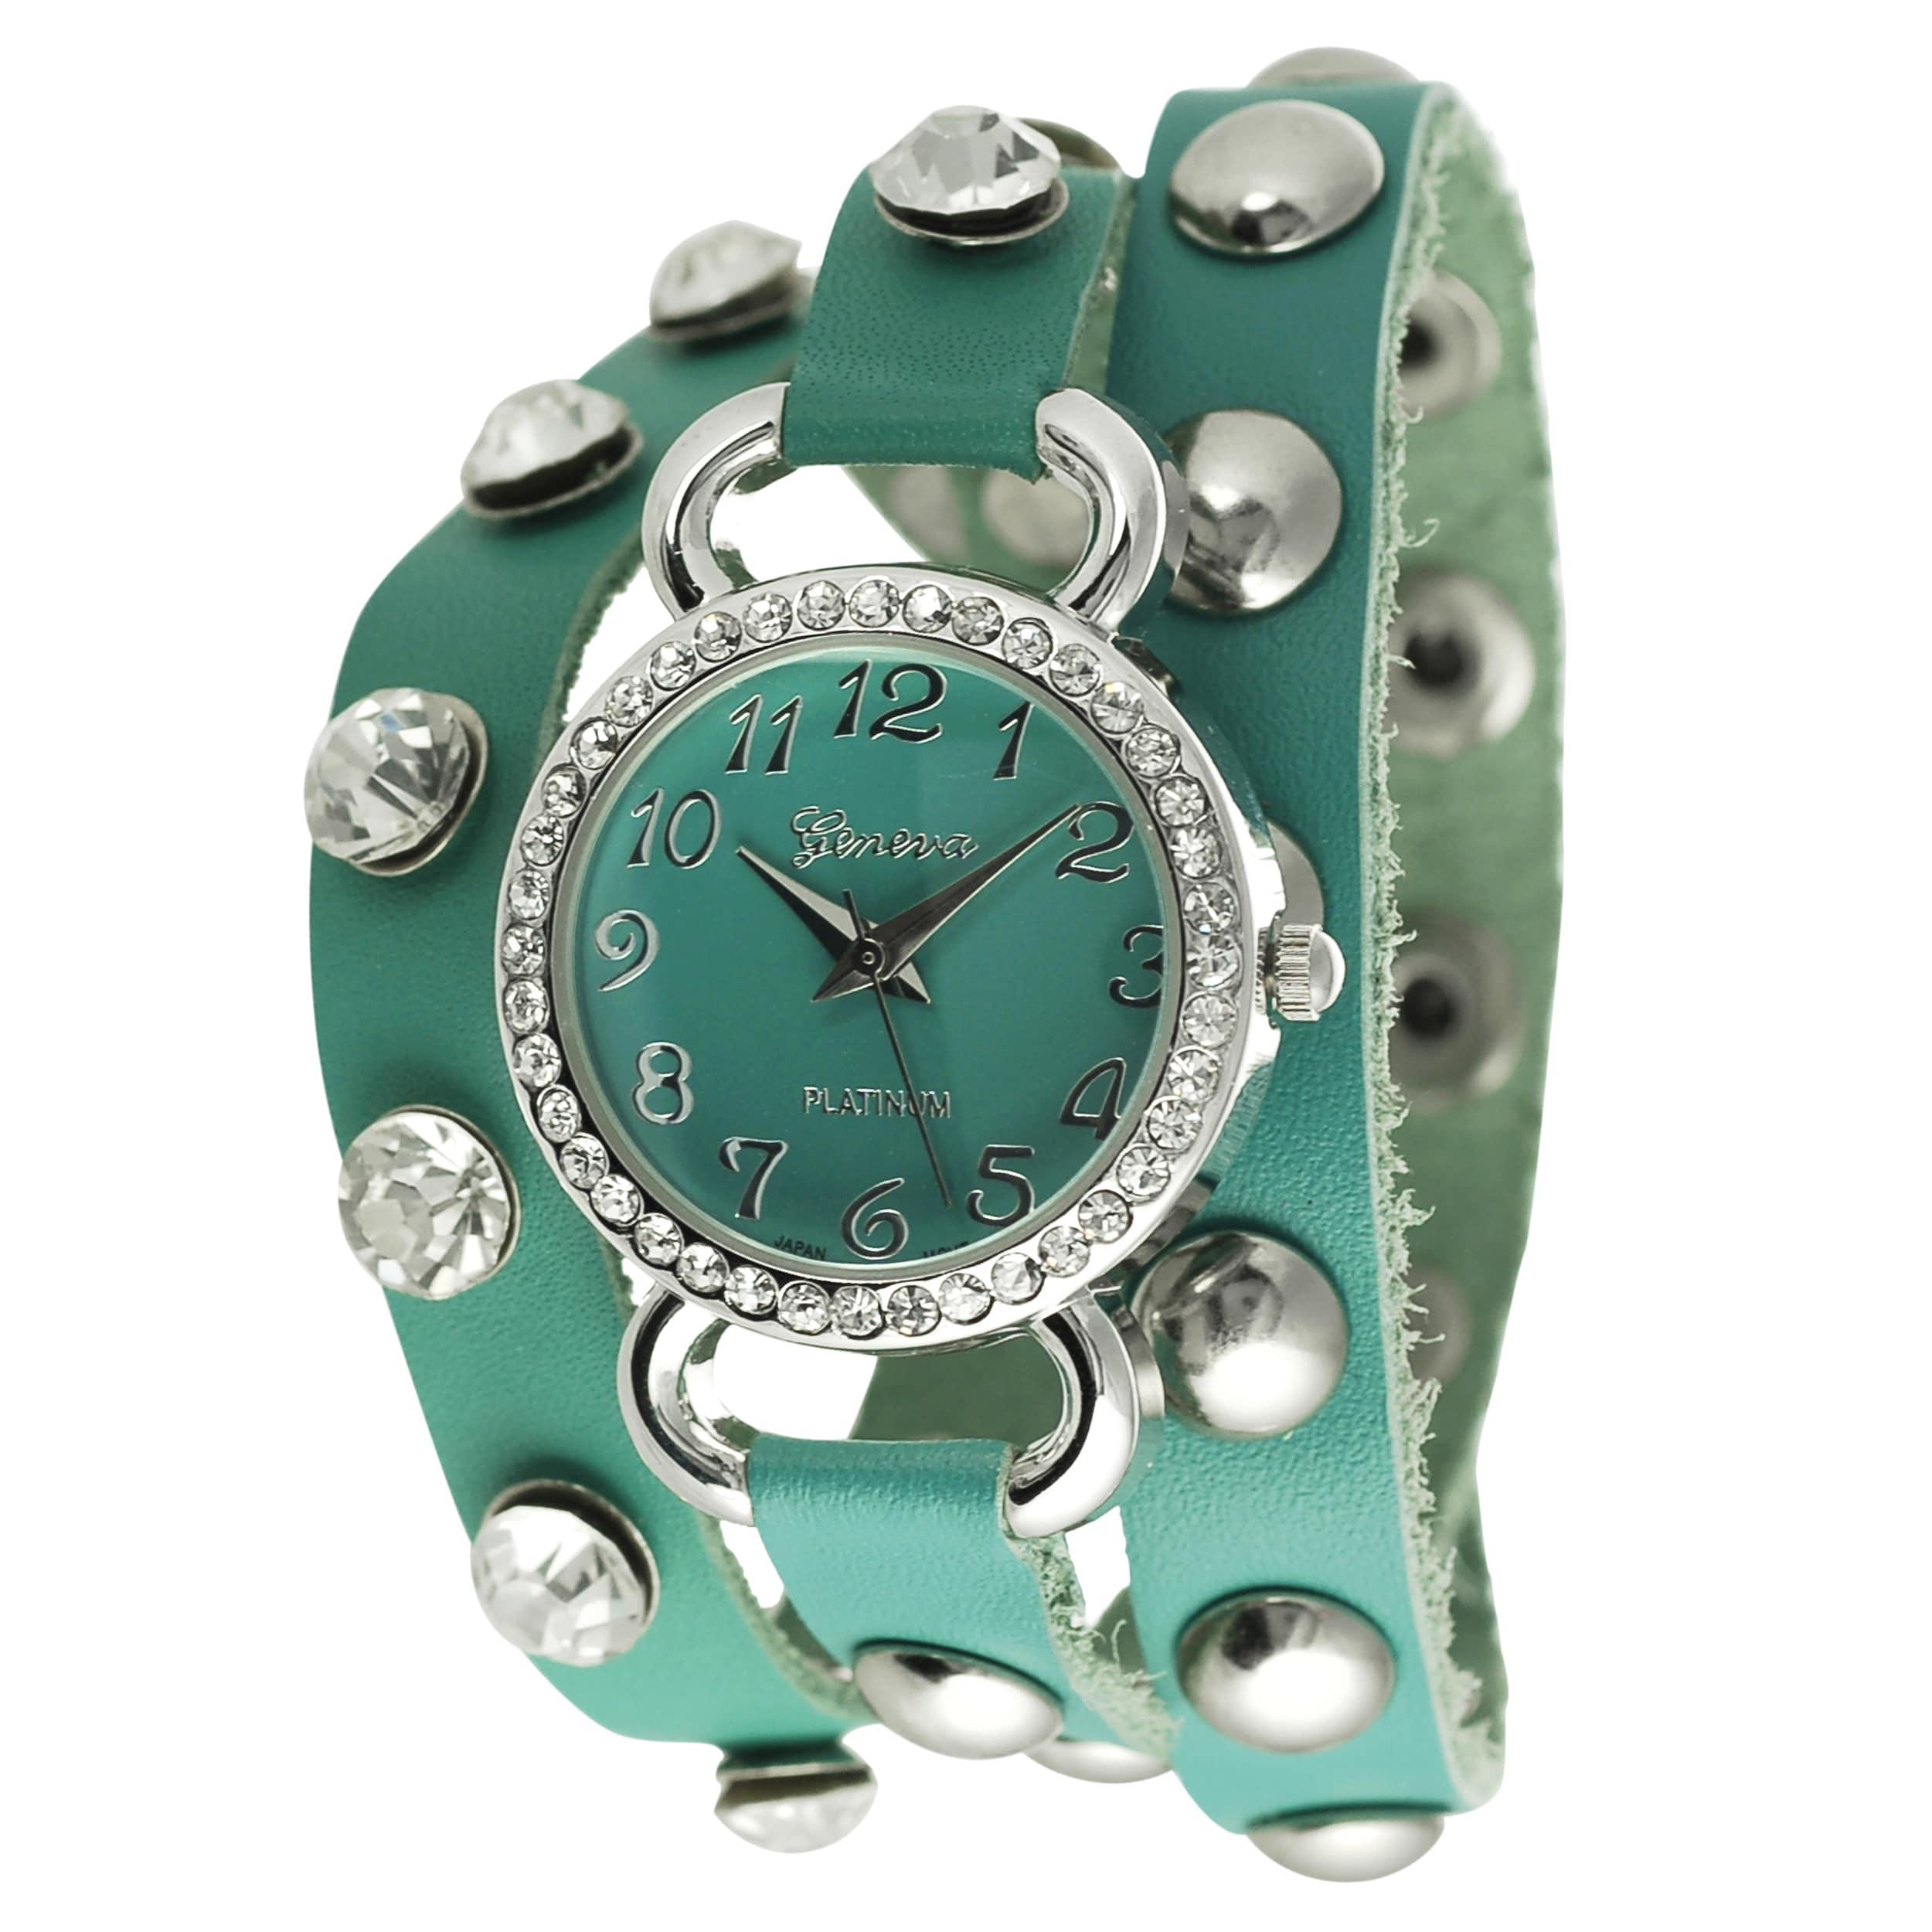 Geneva Platinum Women's Rhinestone Studded Wrap-around Watch